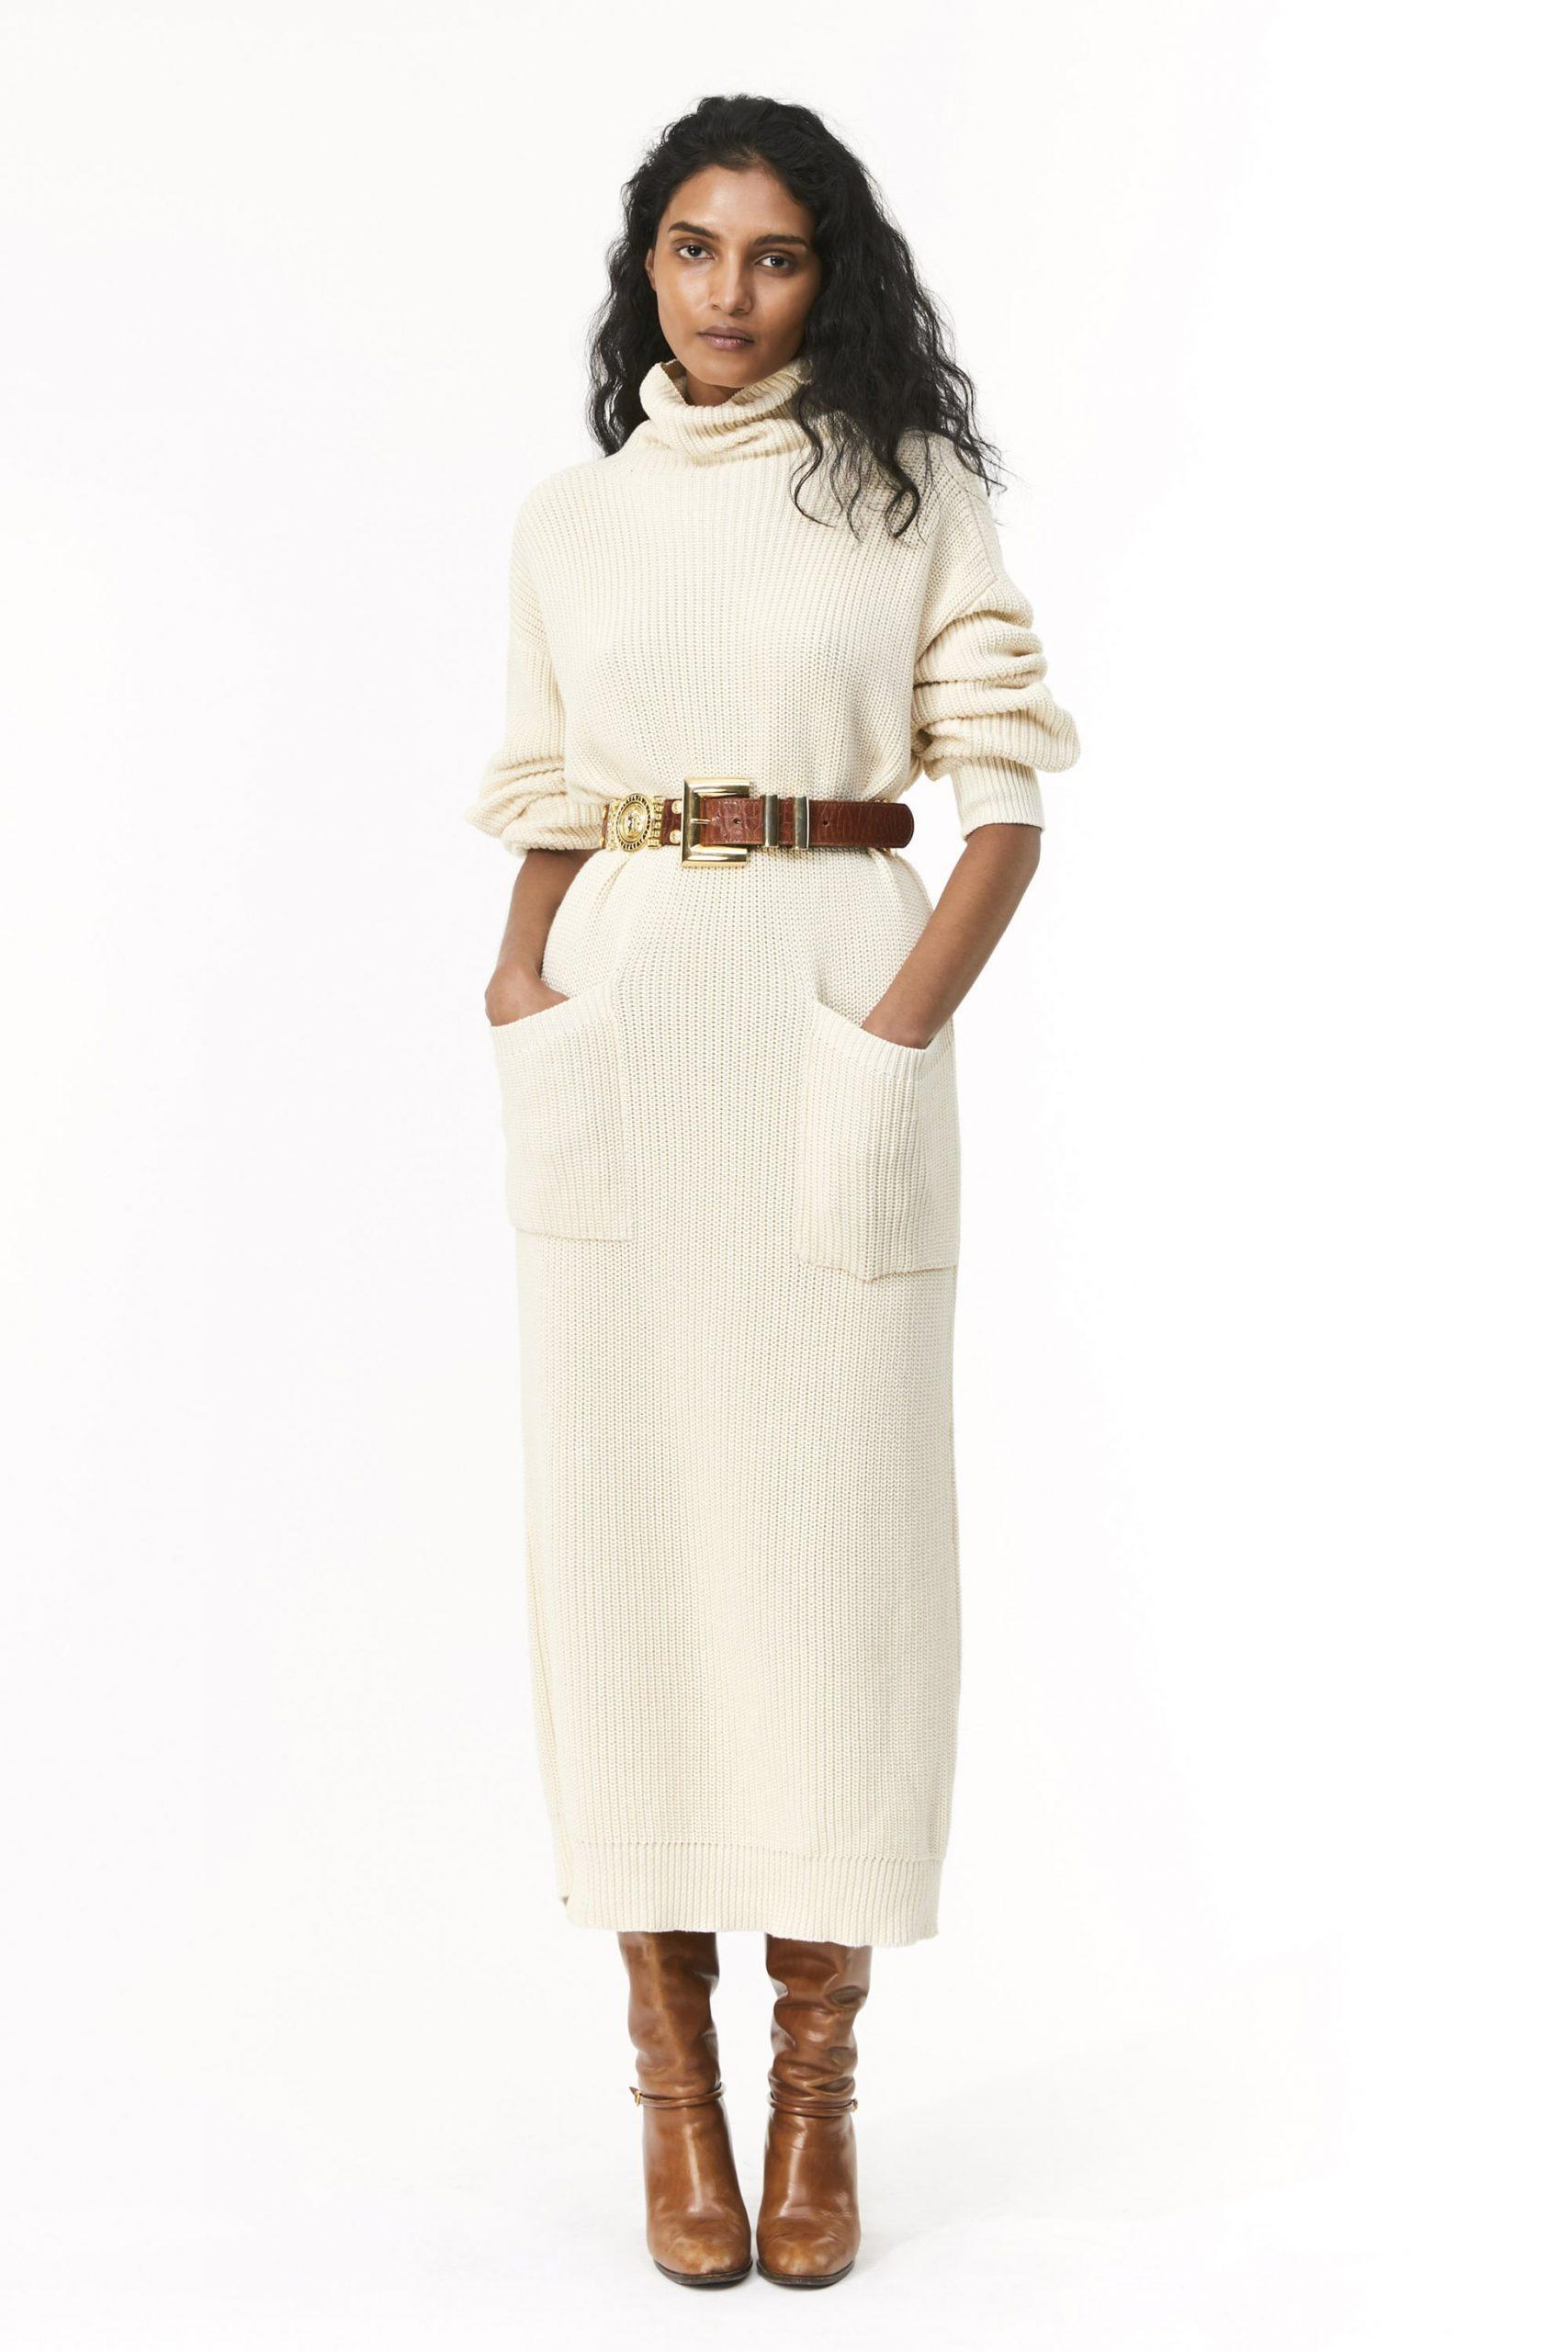 Elsa Sweater Dress, $395 @MaraHoffman.com